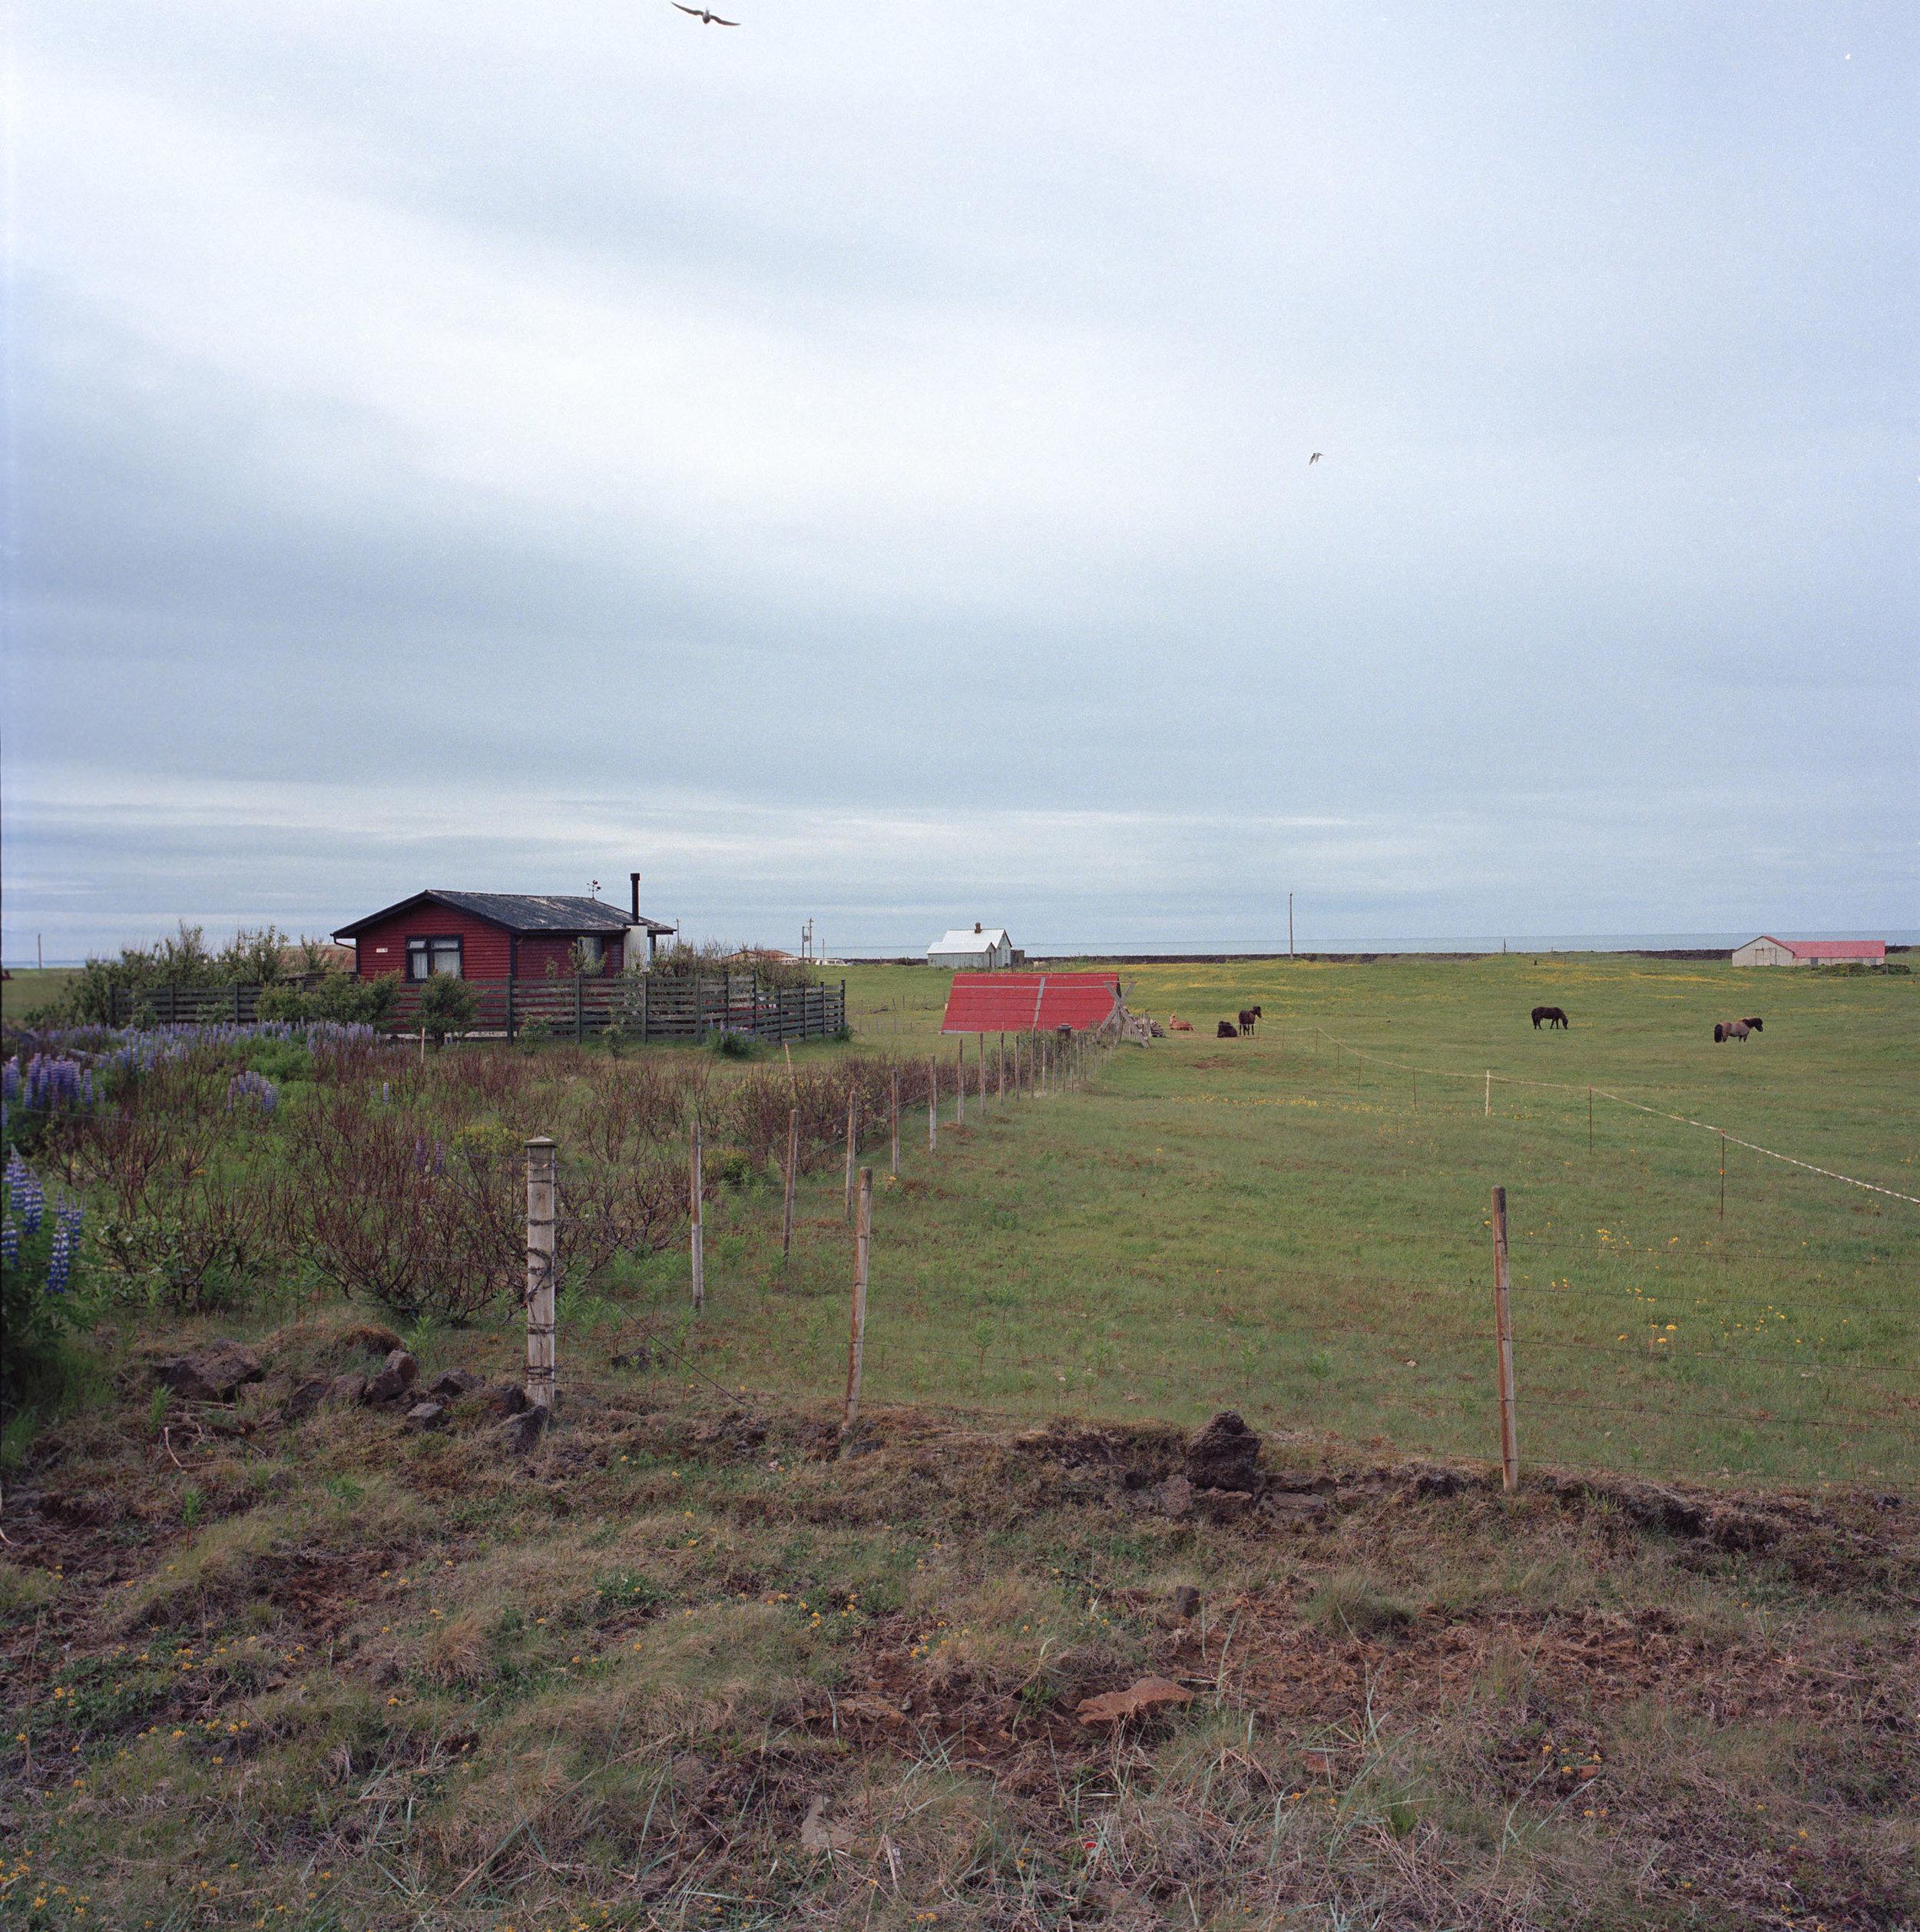 Vik, Iceland (2015)